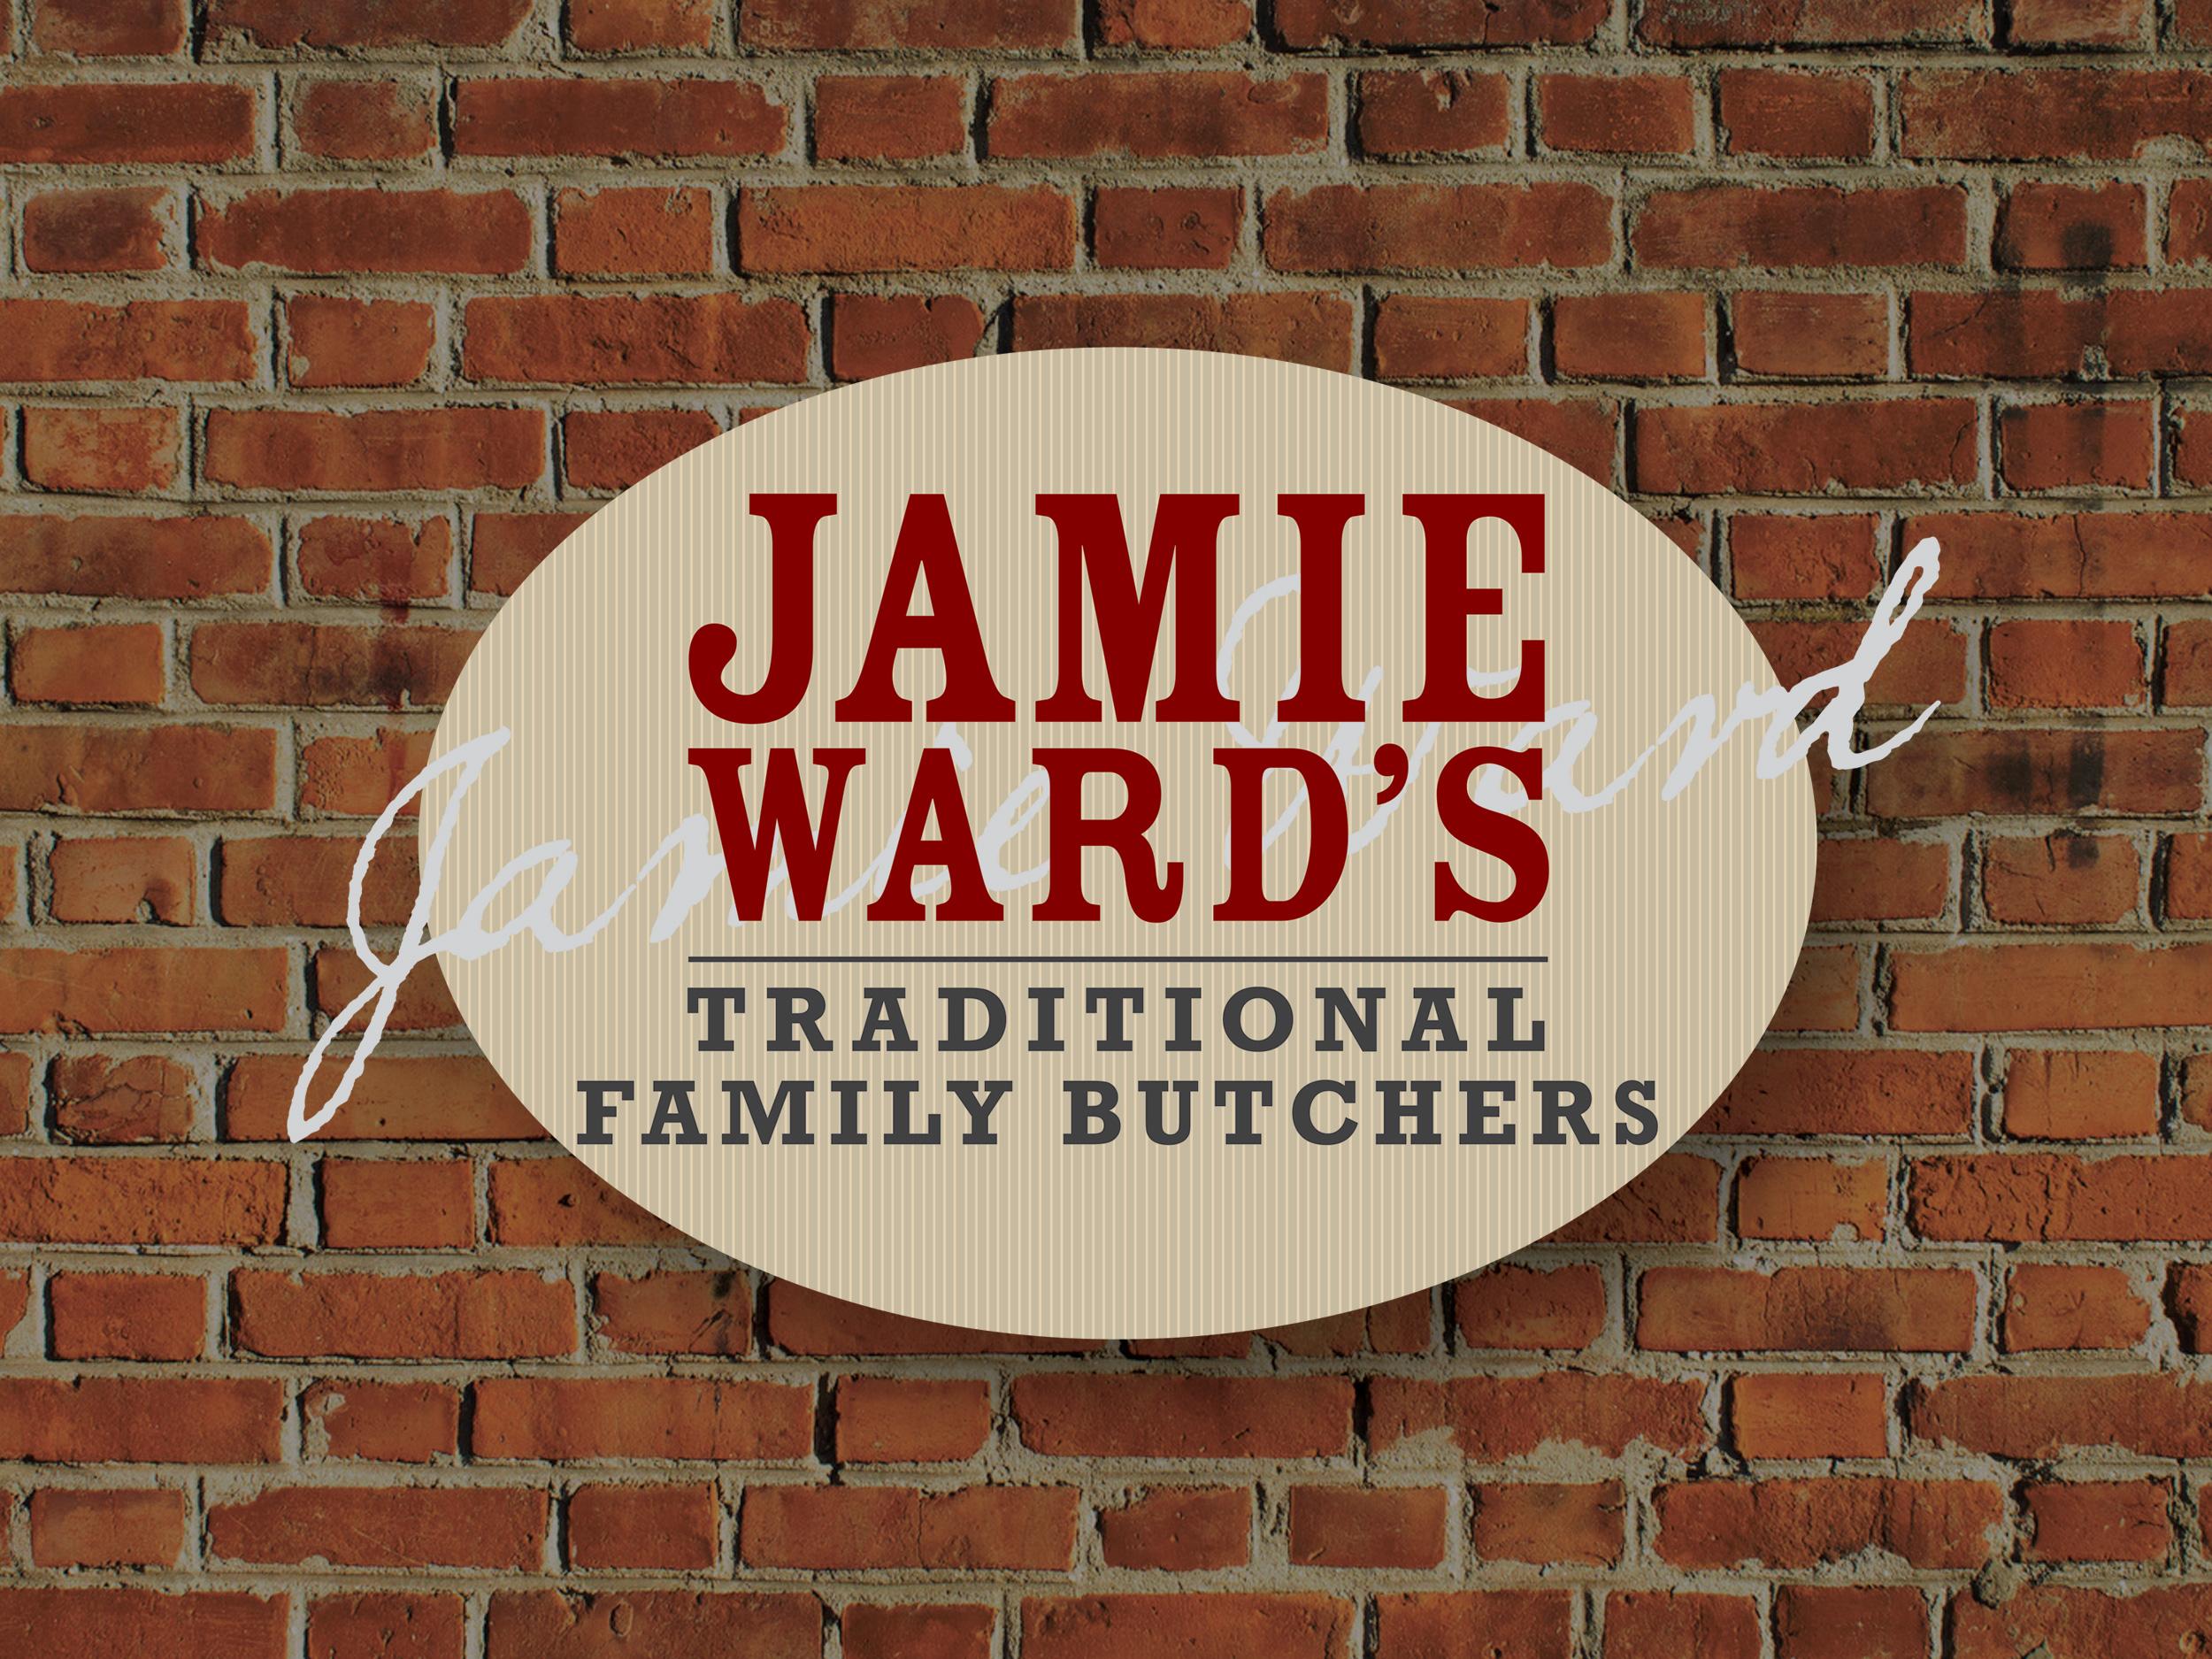 Jamie Ward